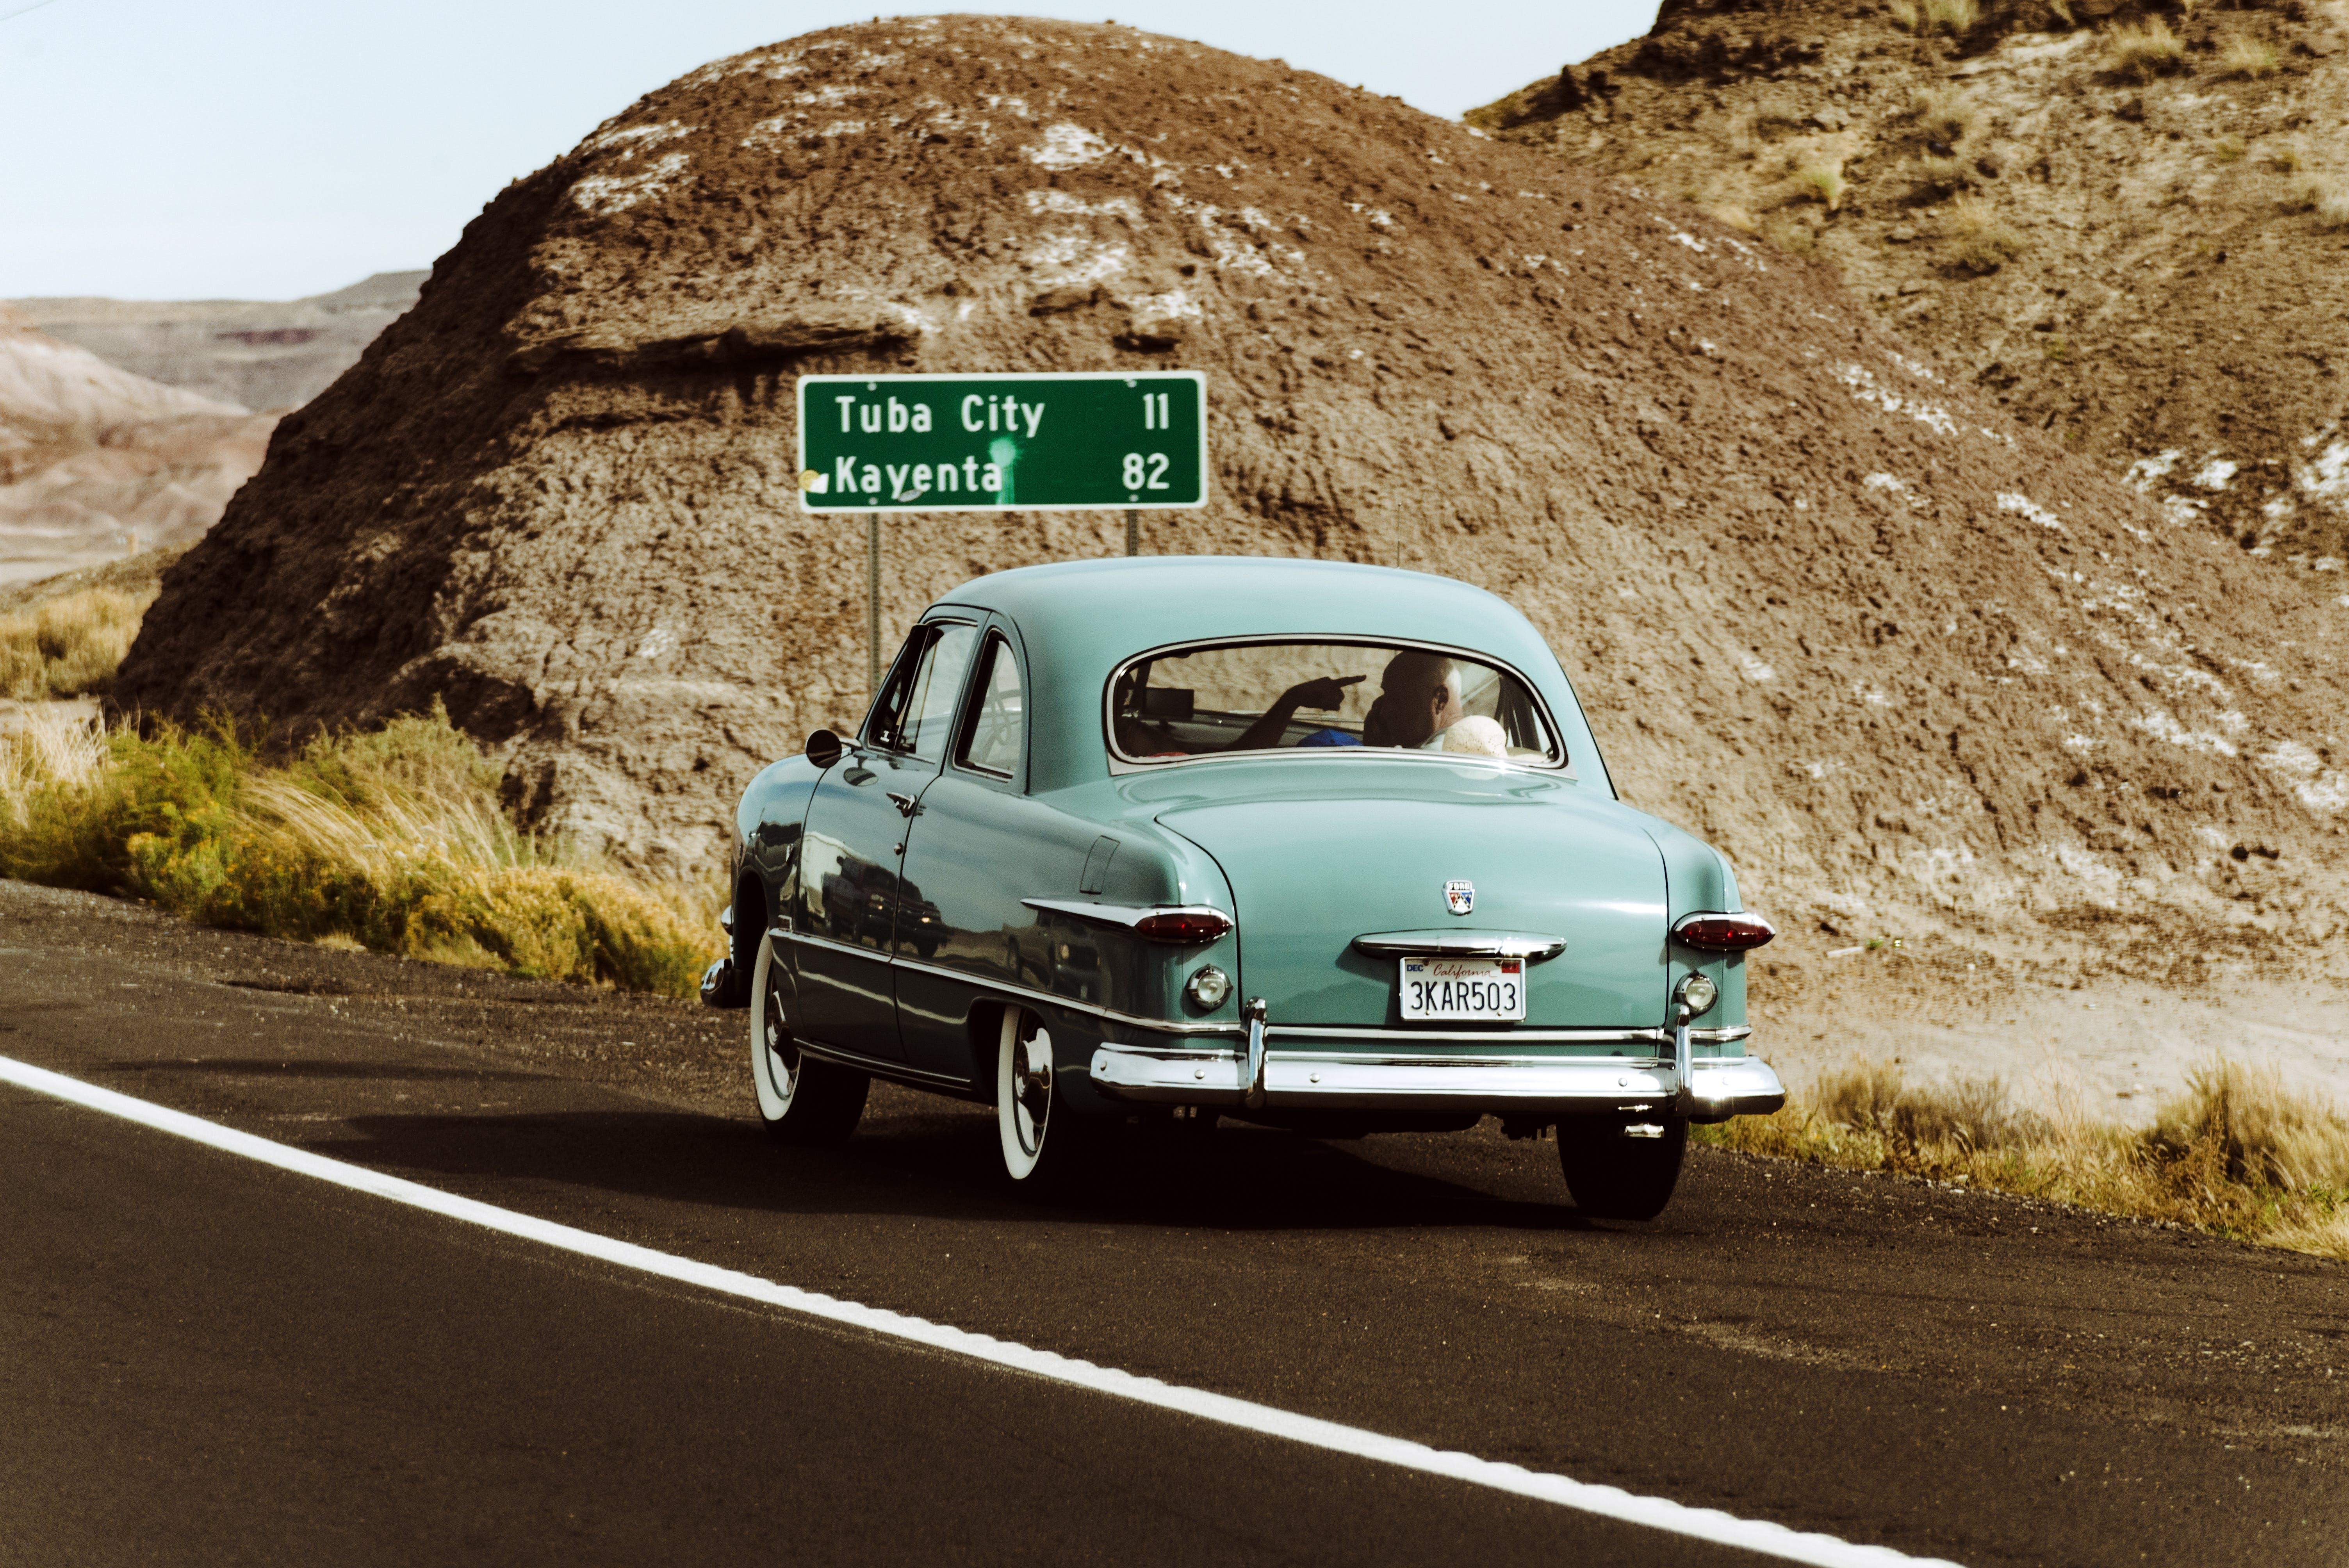 american, american car, arizona